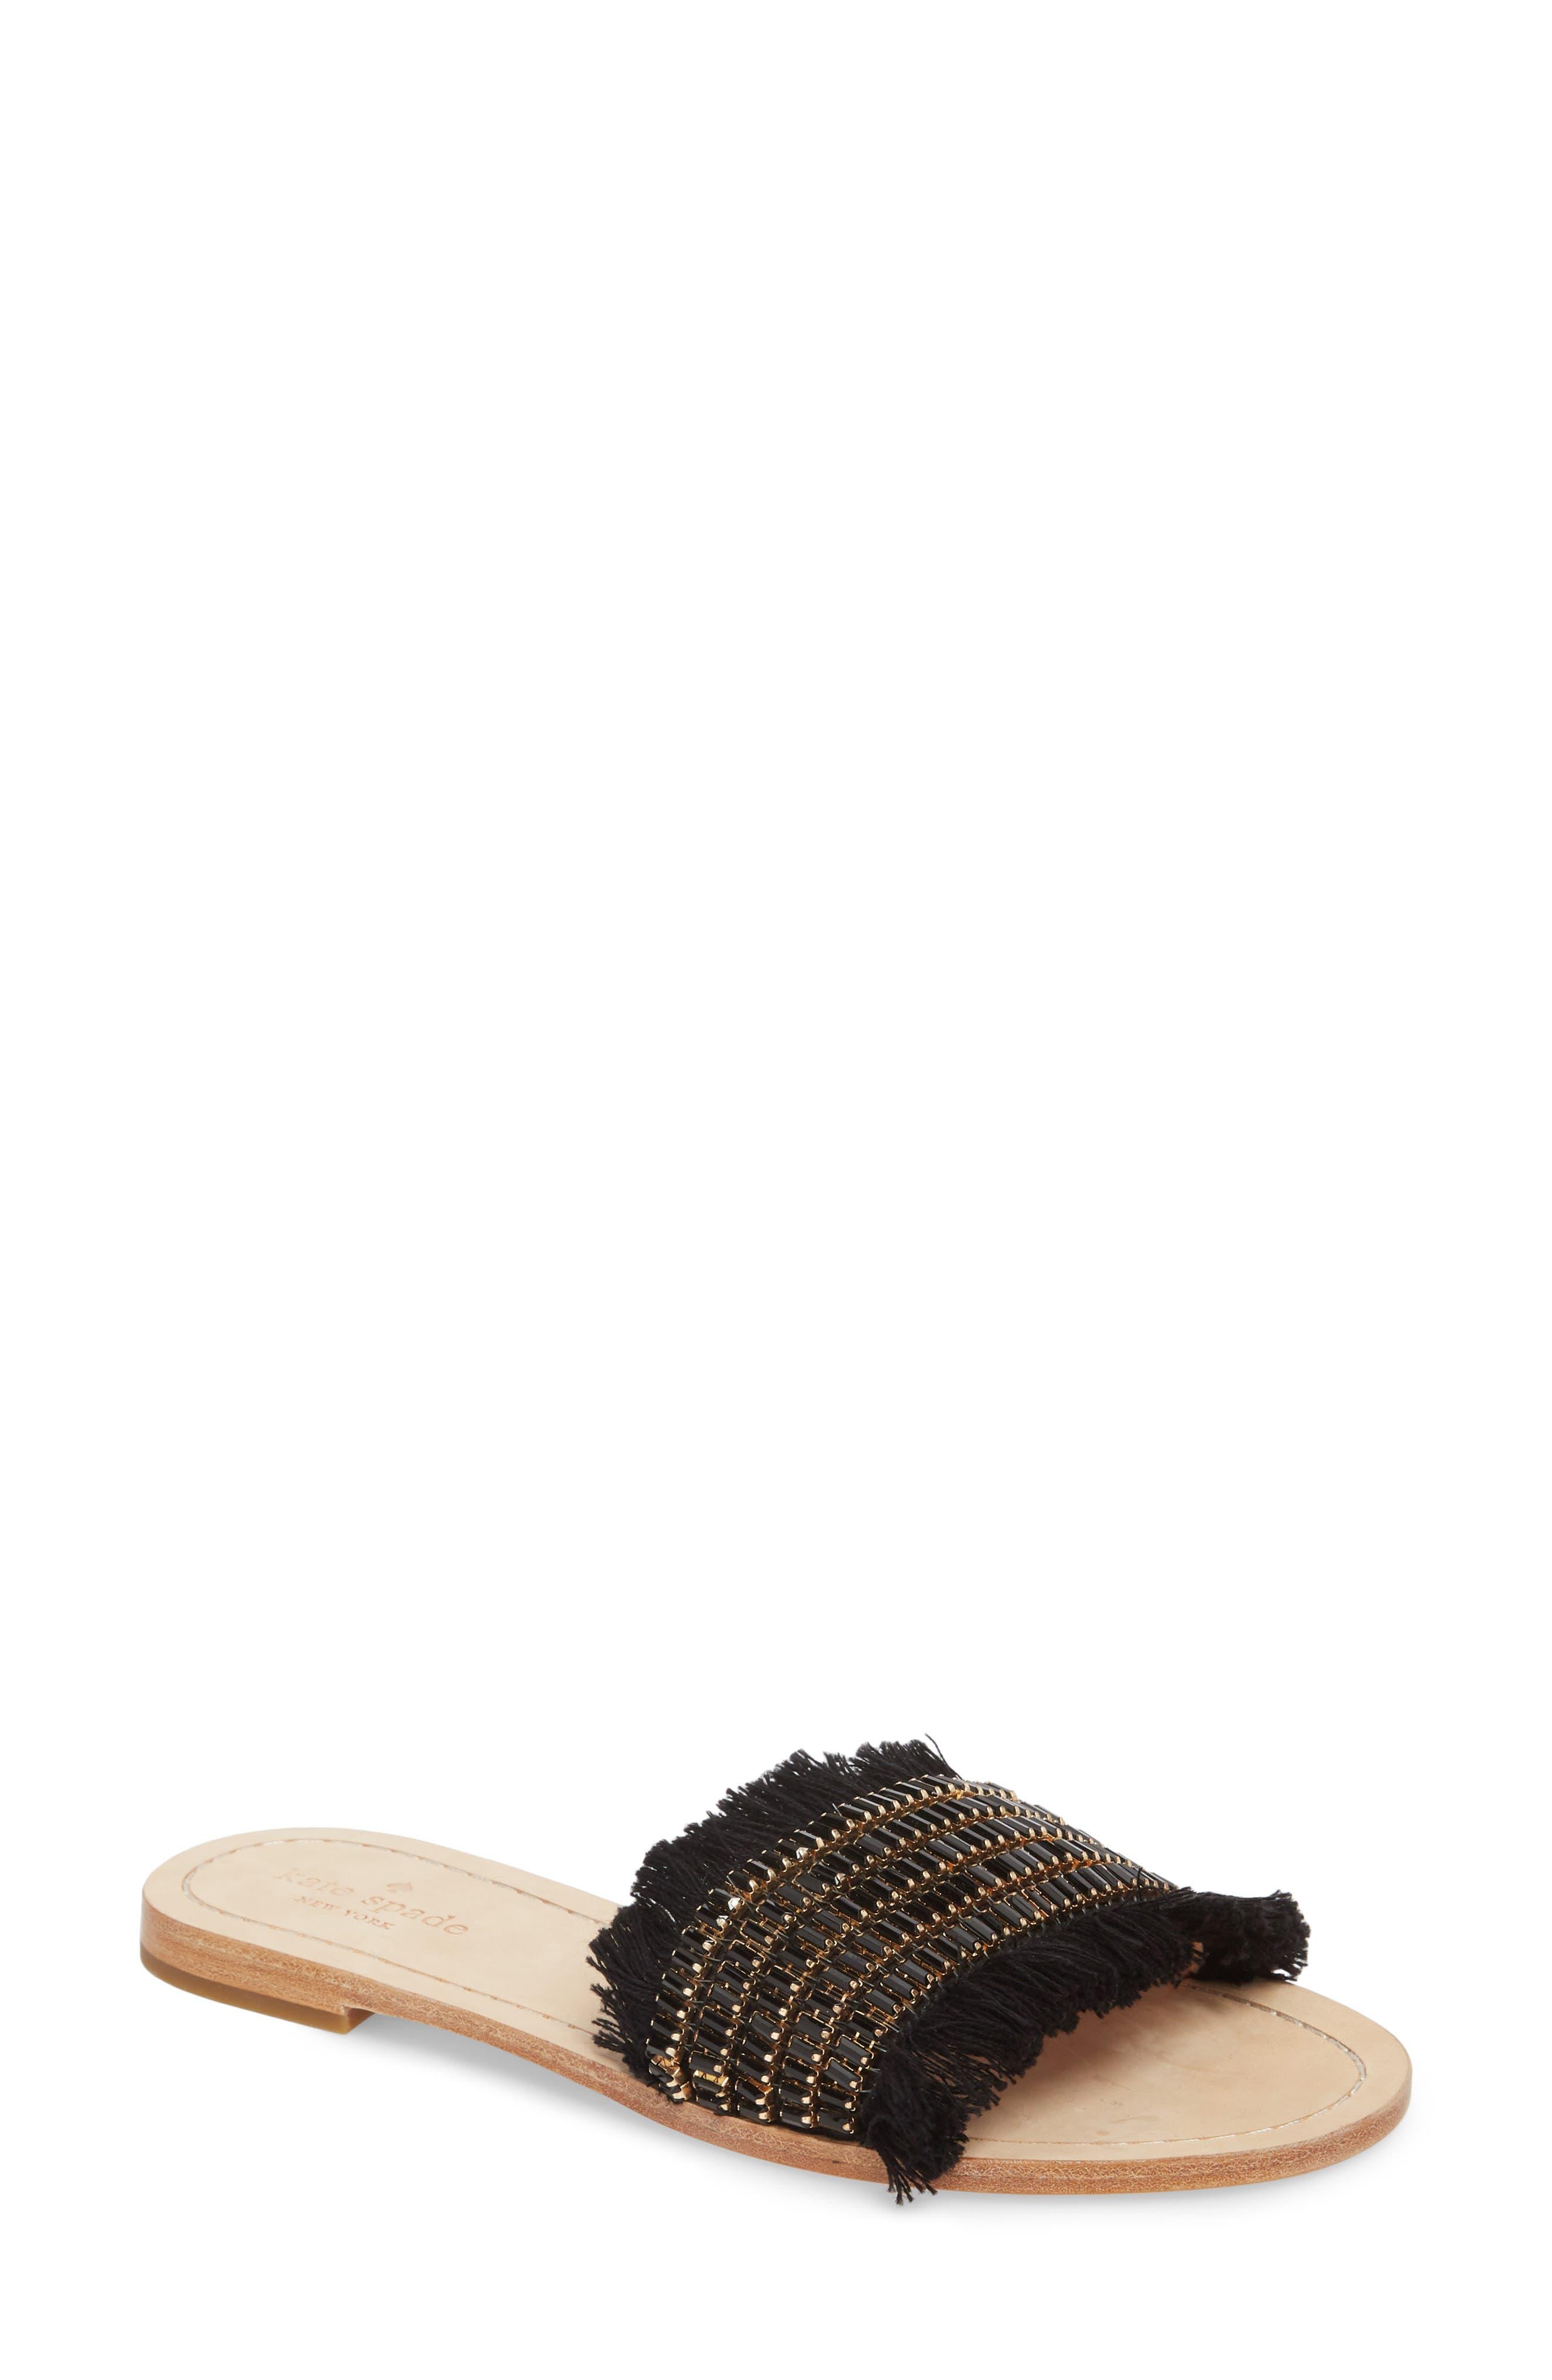 solaina slide sandal,                             Main thumbnail 1, color,